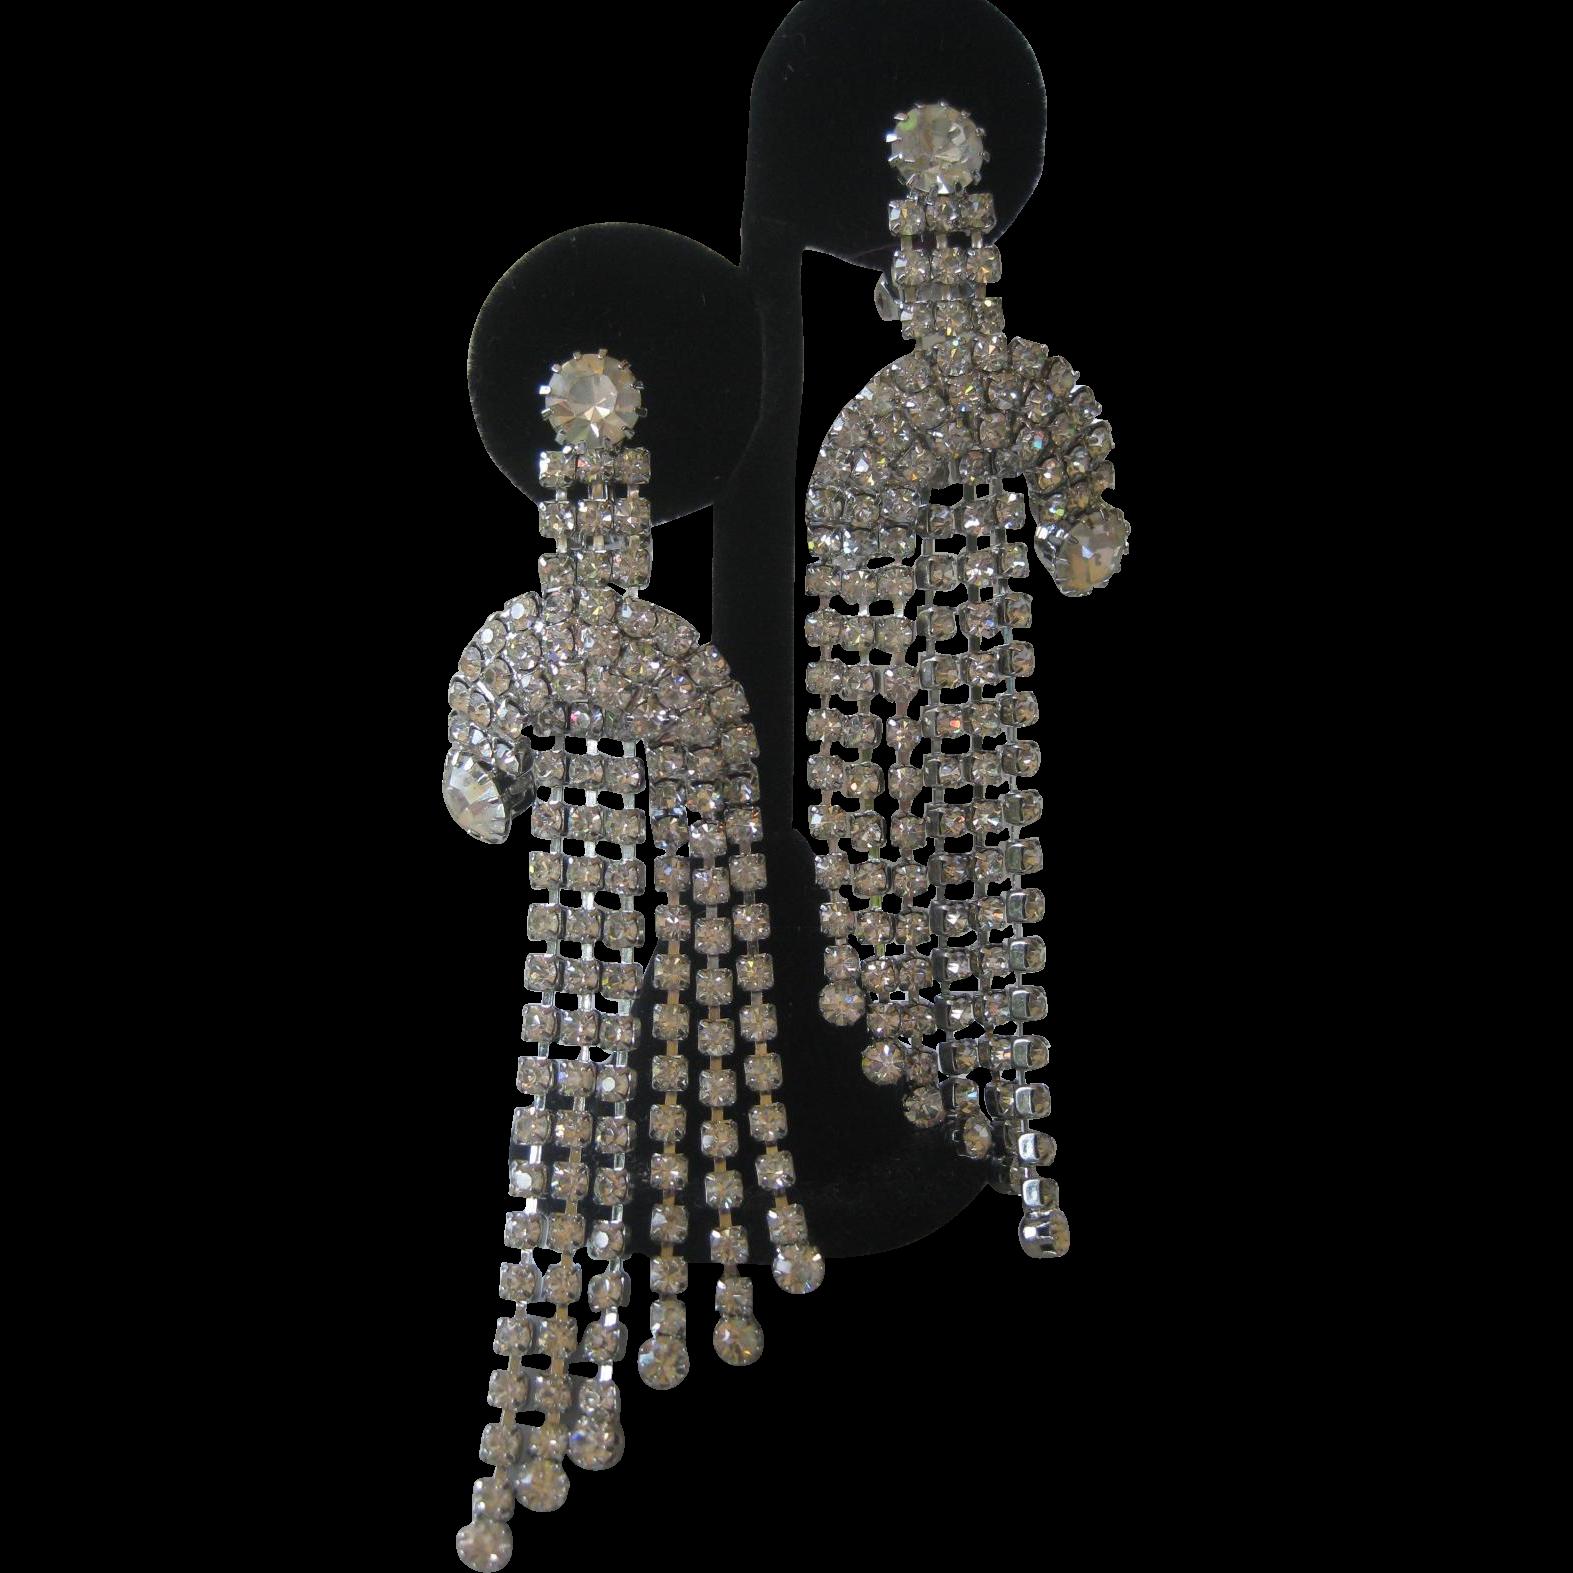 Stunning 1950s Dangling Rhinestones Chandelier Earrings